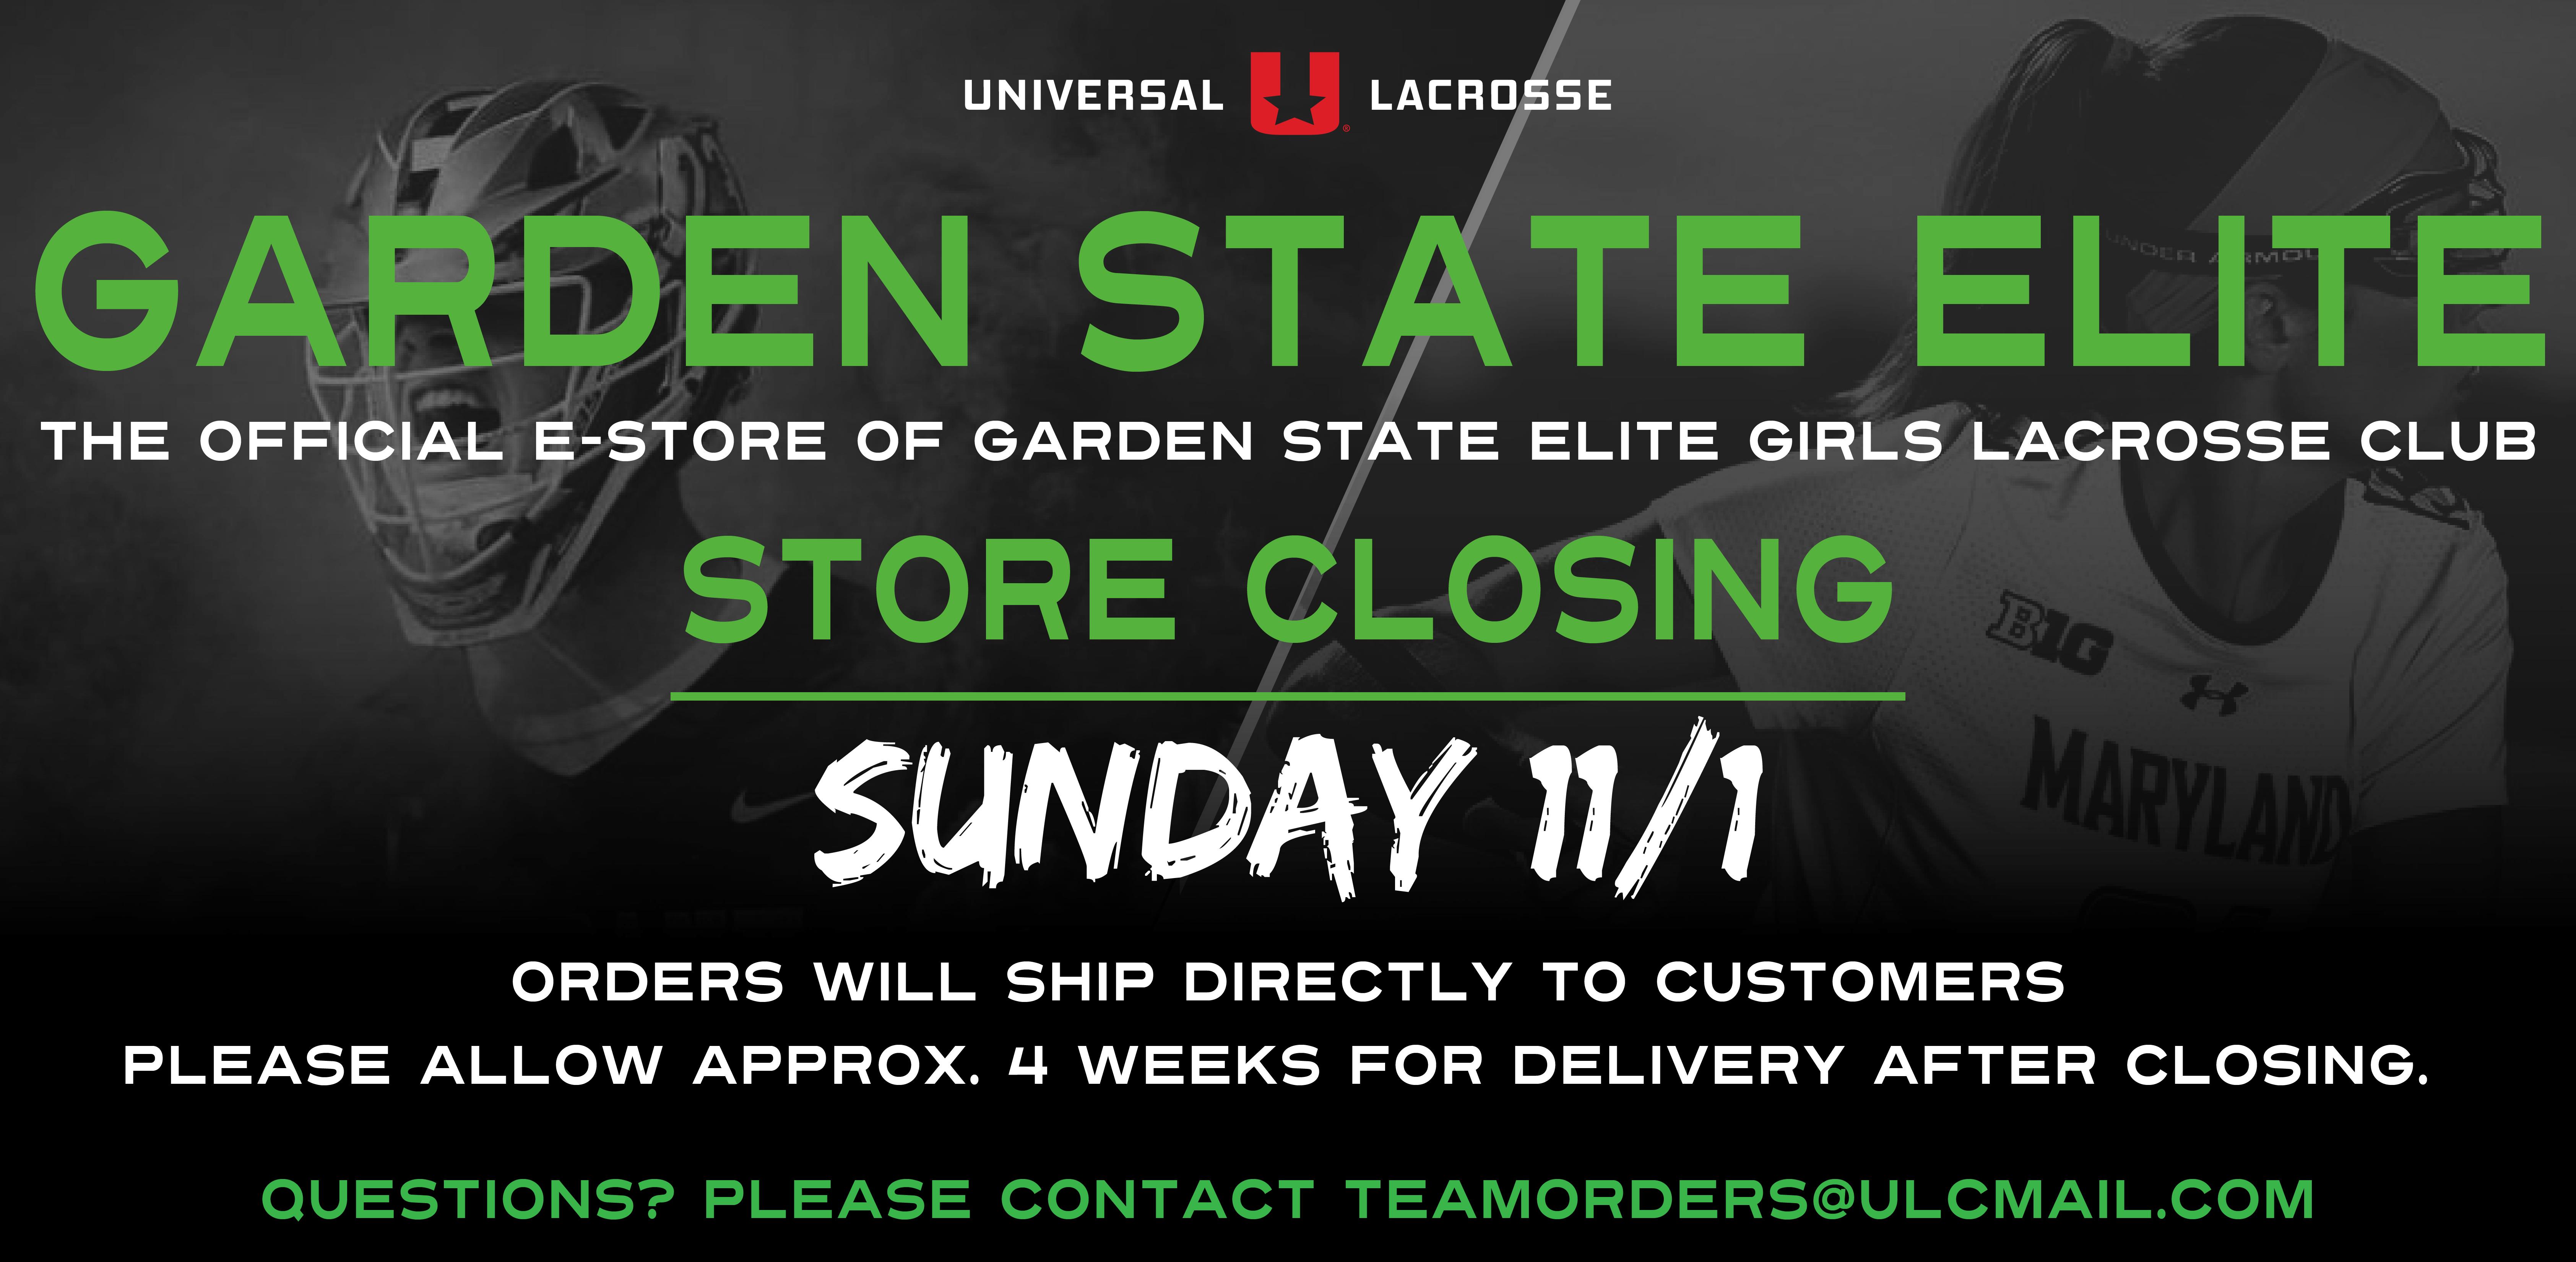 Garden State Elite Girls Lacrosse